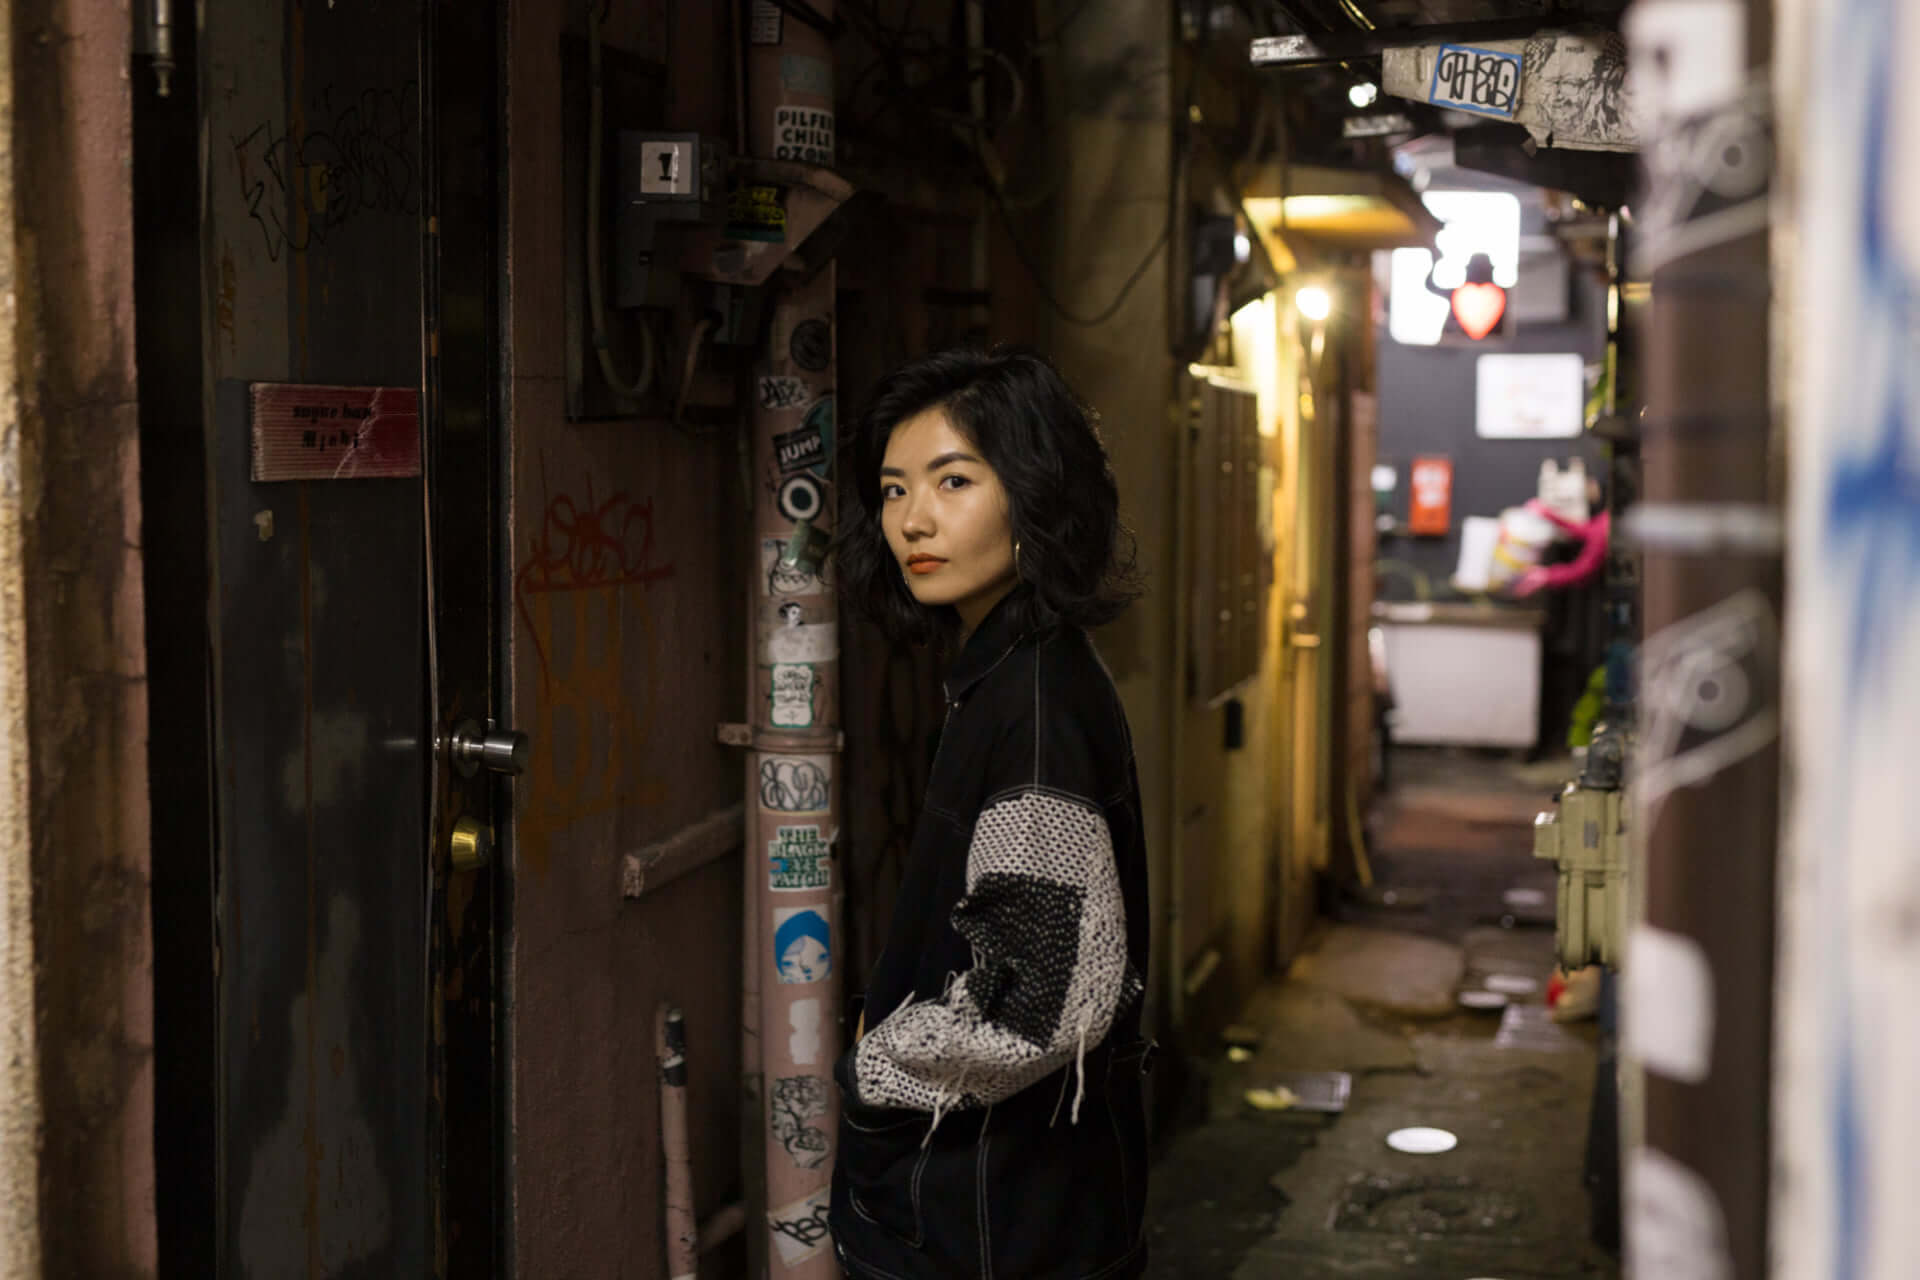 Akari Uragami インタビュー|UKのベースミュージックからカリフォルニアへ 自分と国境の揺らぐ存在を縛る。 interview181210-akariuragami-kewl-eita-1-1920x1280